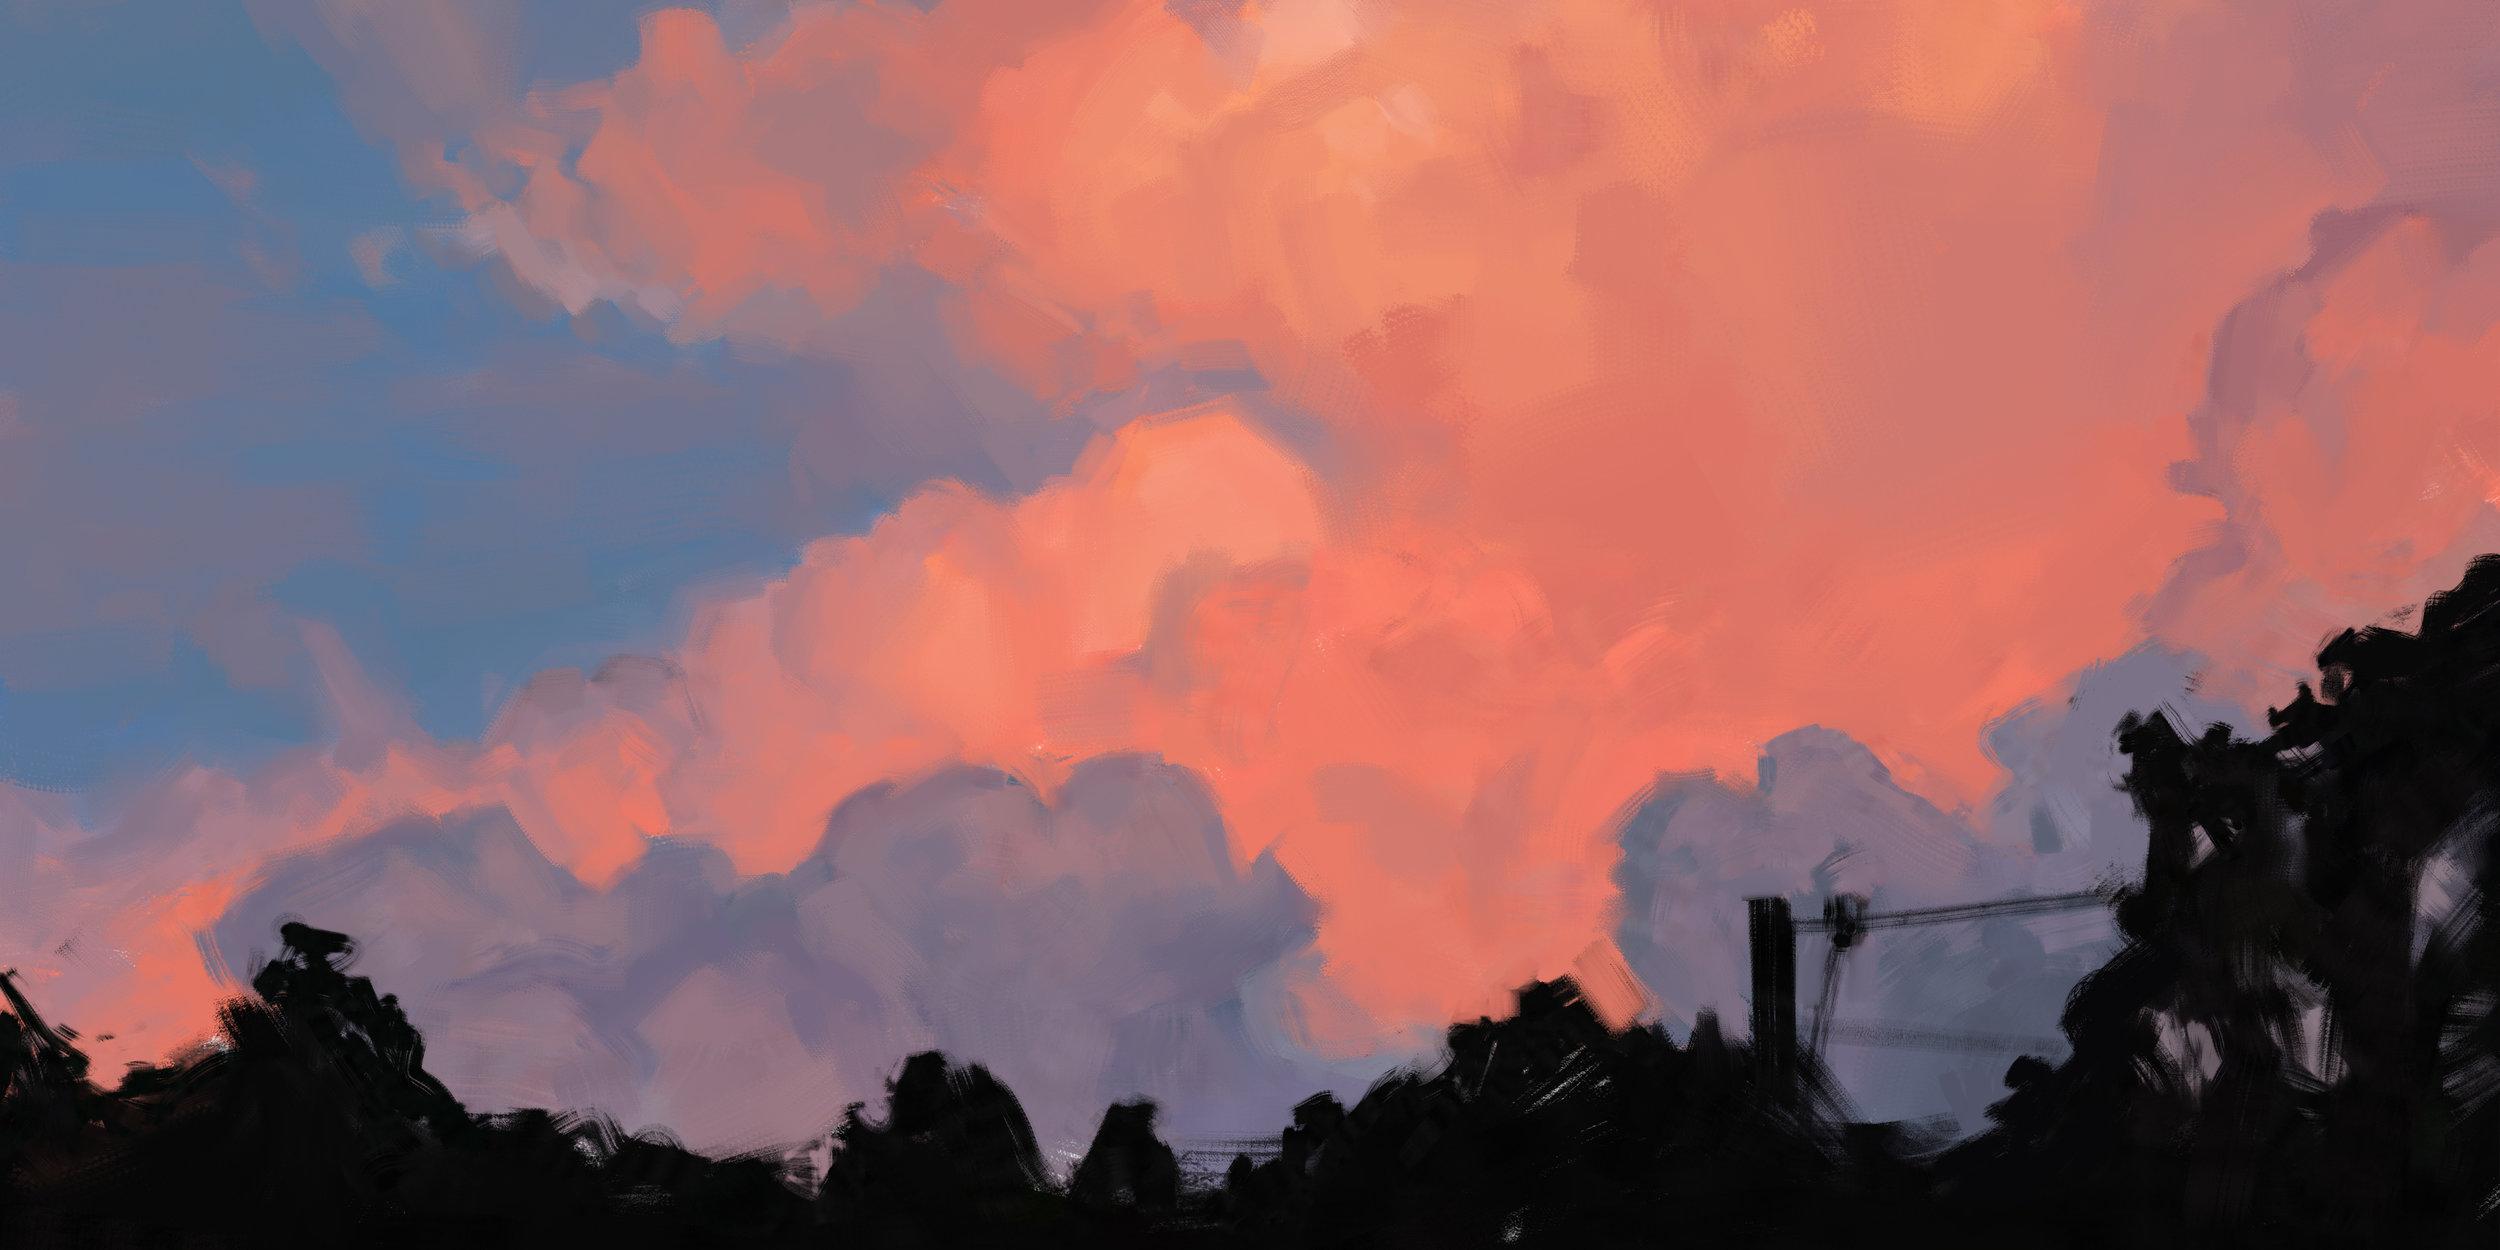 Newton_Orange Clouds_Digital_6499x3249.jpg